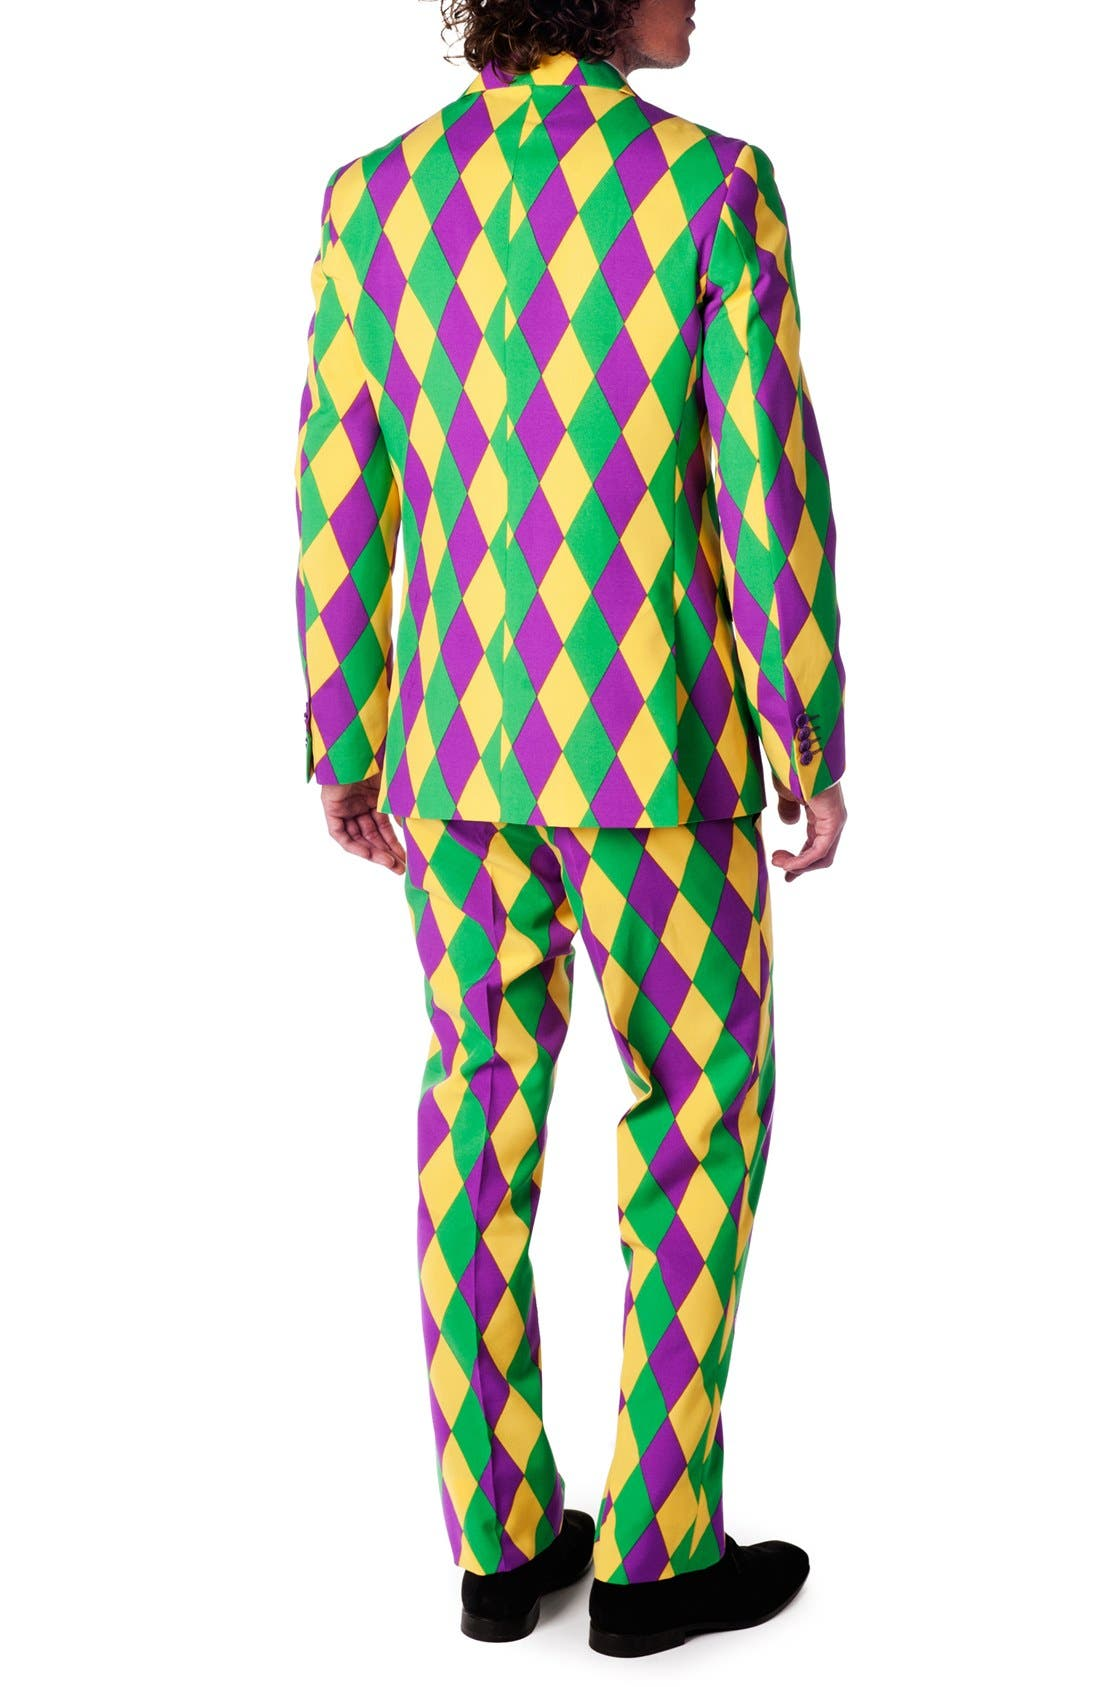 'Harleking' Trim Fit Suit with Tie,                             Alternate thumbnail 6, color,                             300